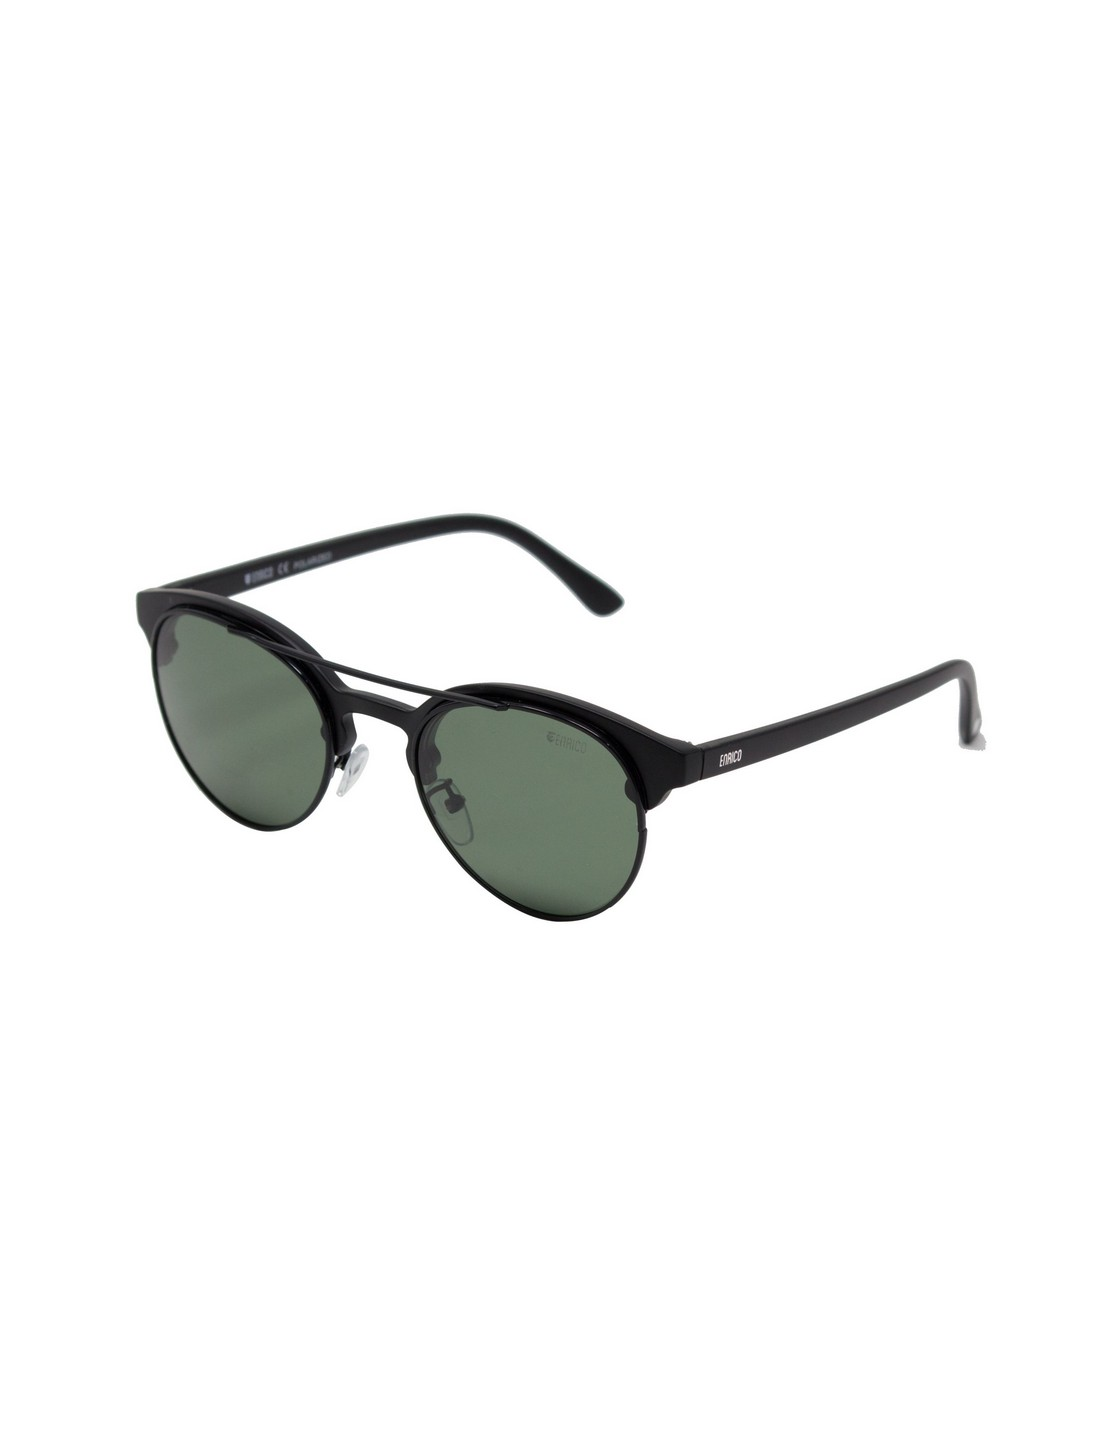 ENRICO | ENRICO Pompom UV Protected Round Unisex Sunglasses ( Lens - Green | Frame - Black)